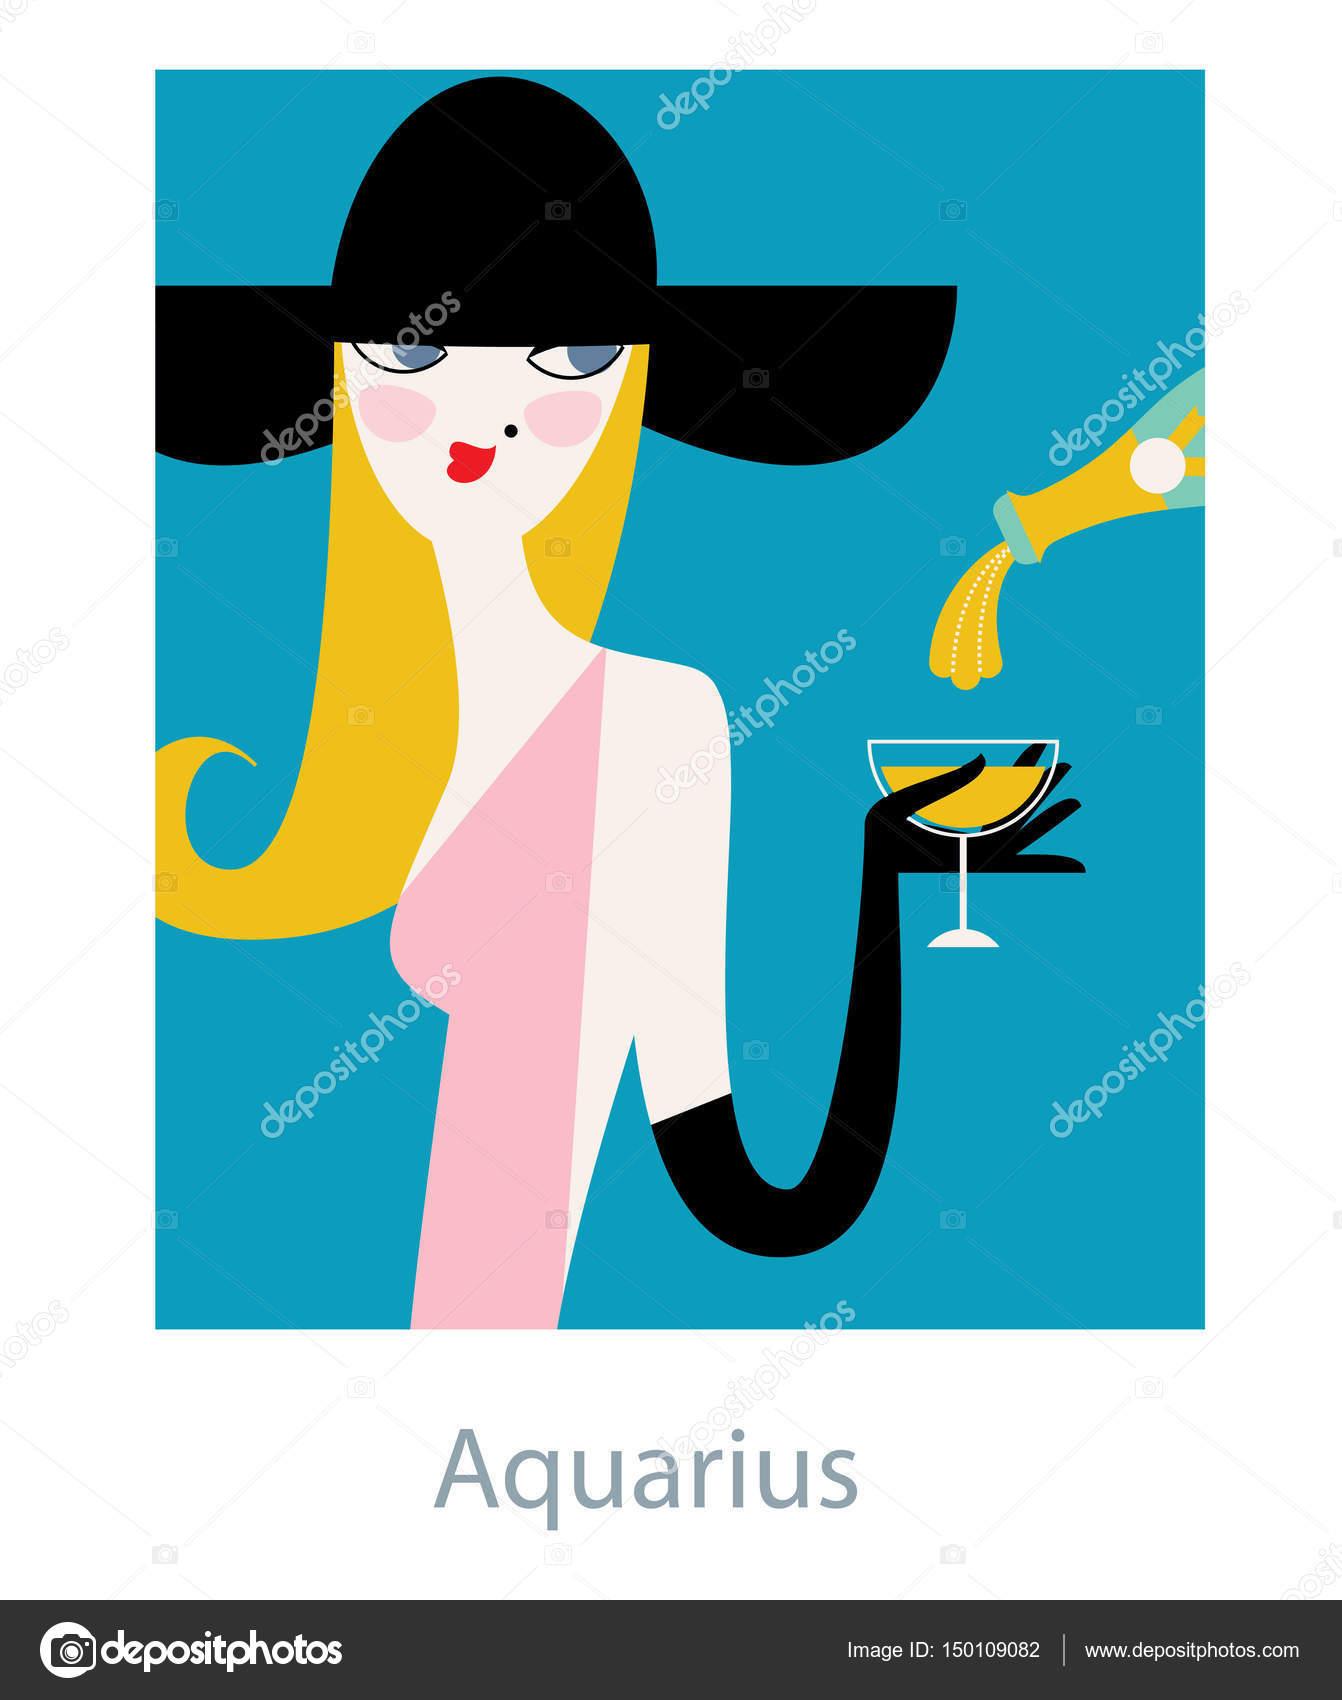 Aquarius horoscope sign as a woman drinking champagne and wearing aquarius horoscope sign as a woman drinking champagne and wearing big retro style hat buycottarizona